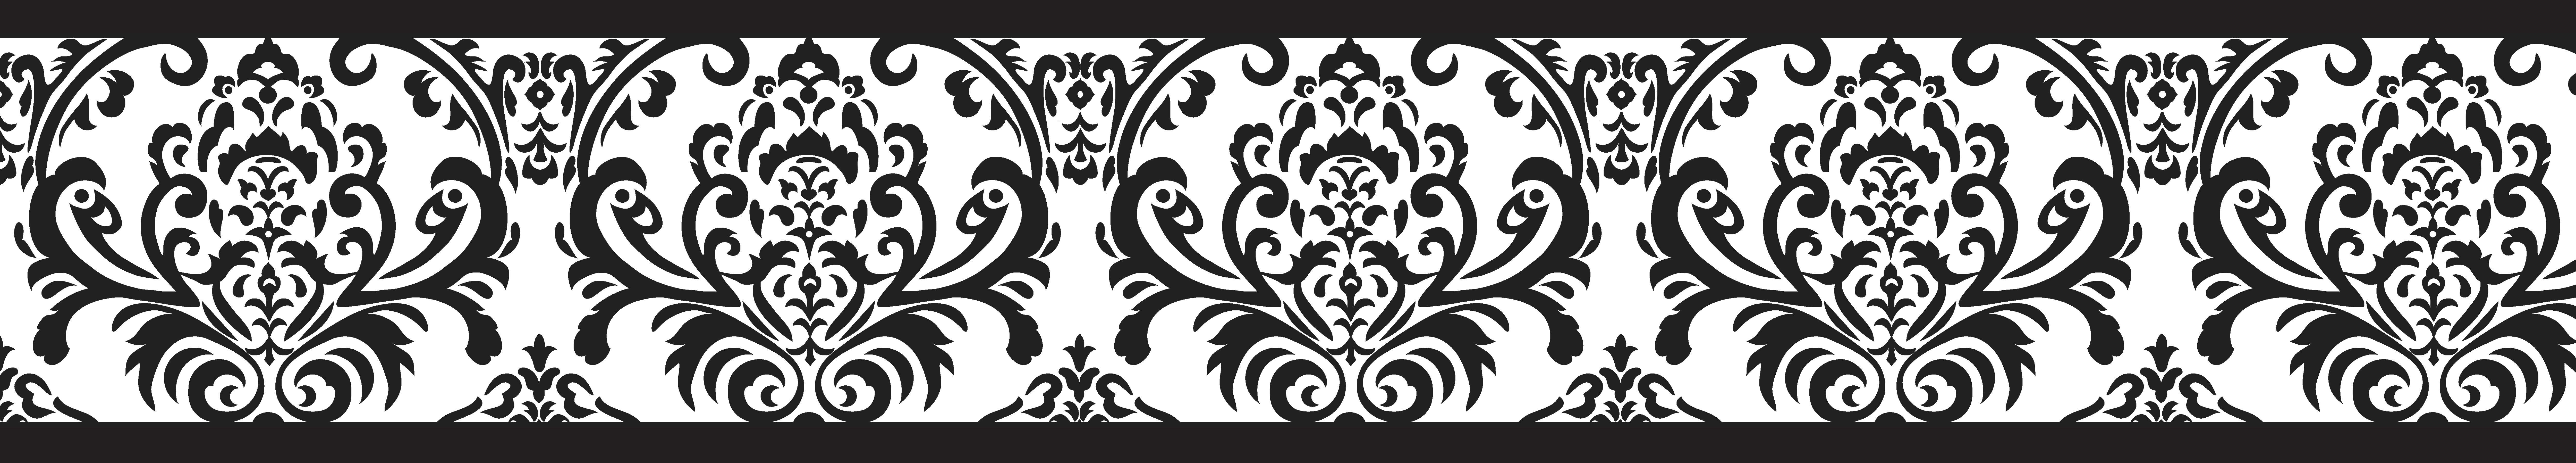 Sweet Jojo Designs Isabella 15 X 6 Damask Border Wallpaper Reviews